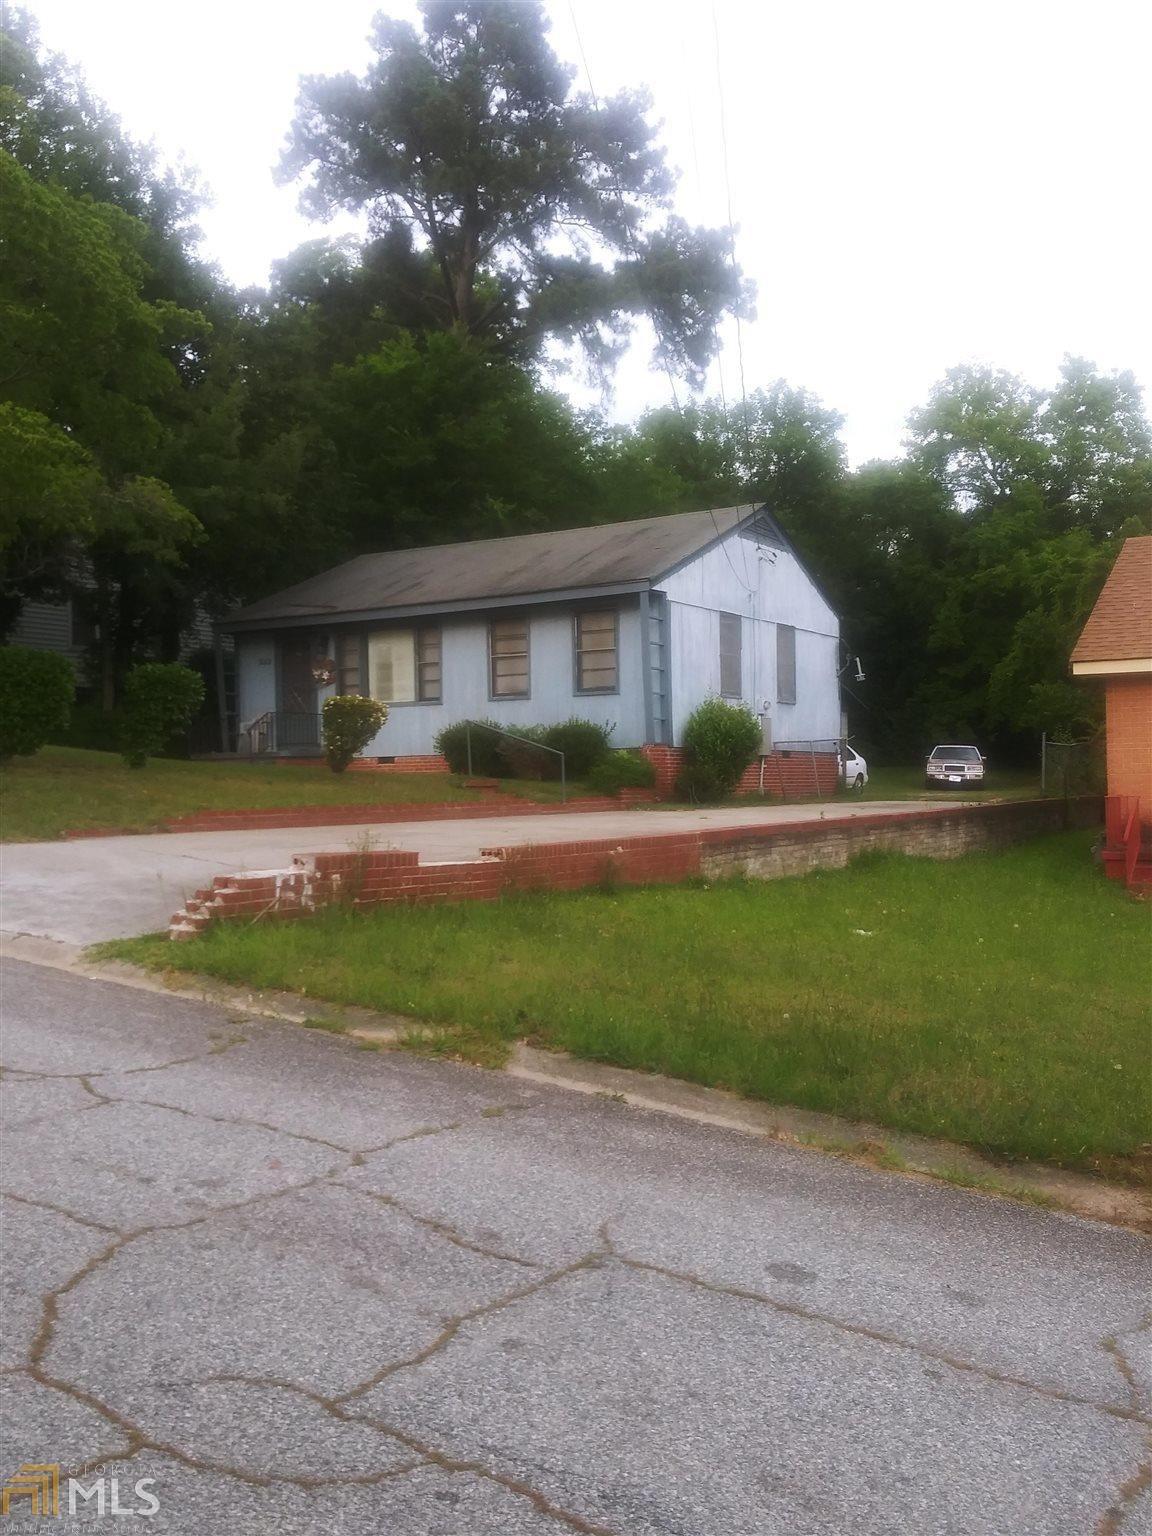 3182 Brownell Ave, Macon, GA 31206 - MLS#: 8992859